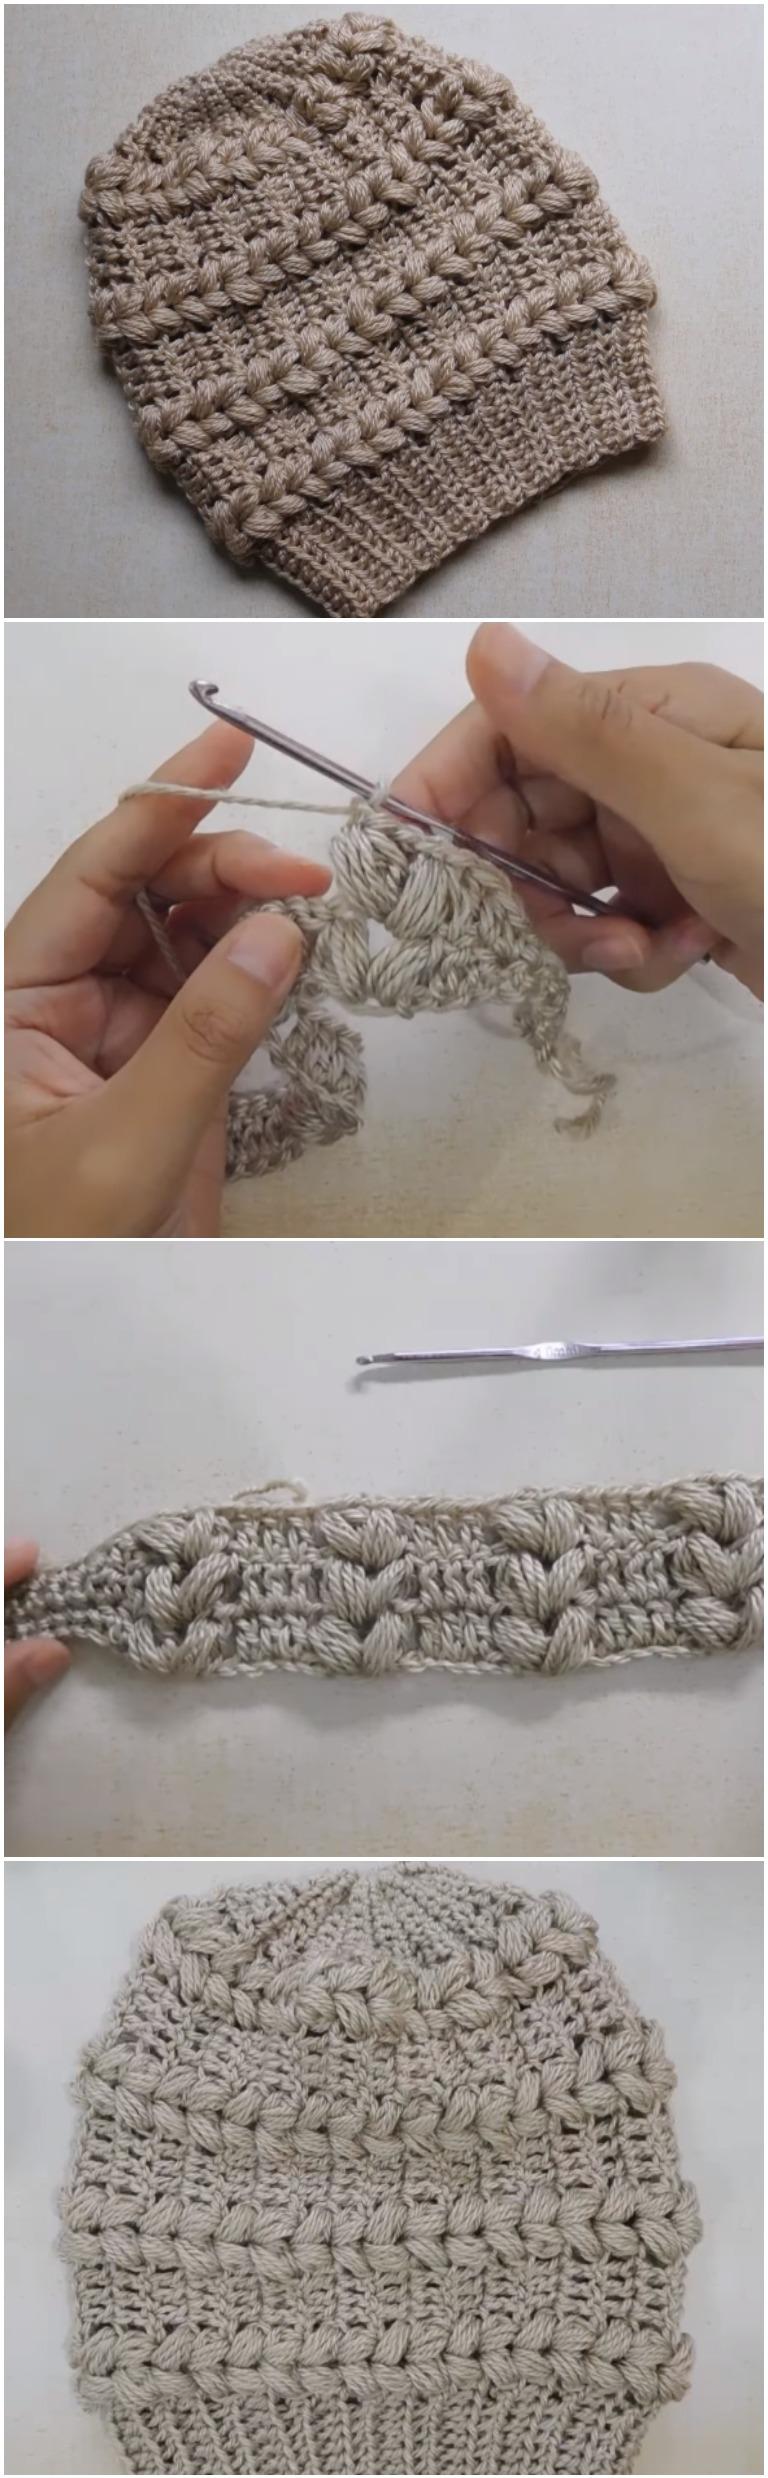 Crochet Beautiful Beanie Hat Fantasy Puff Stitch